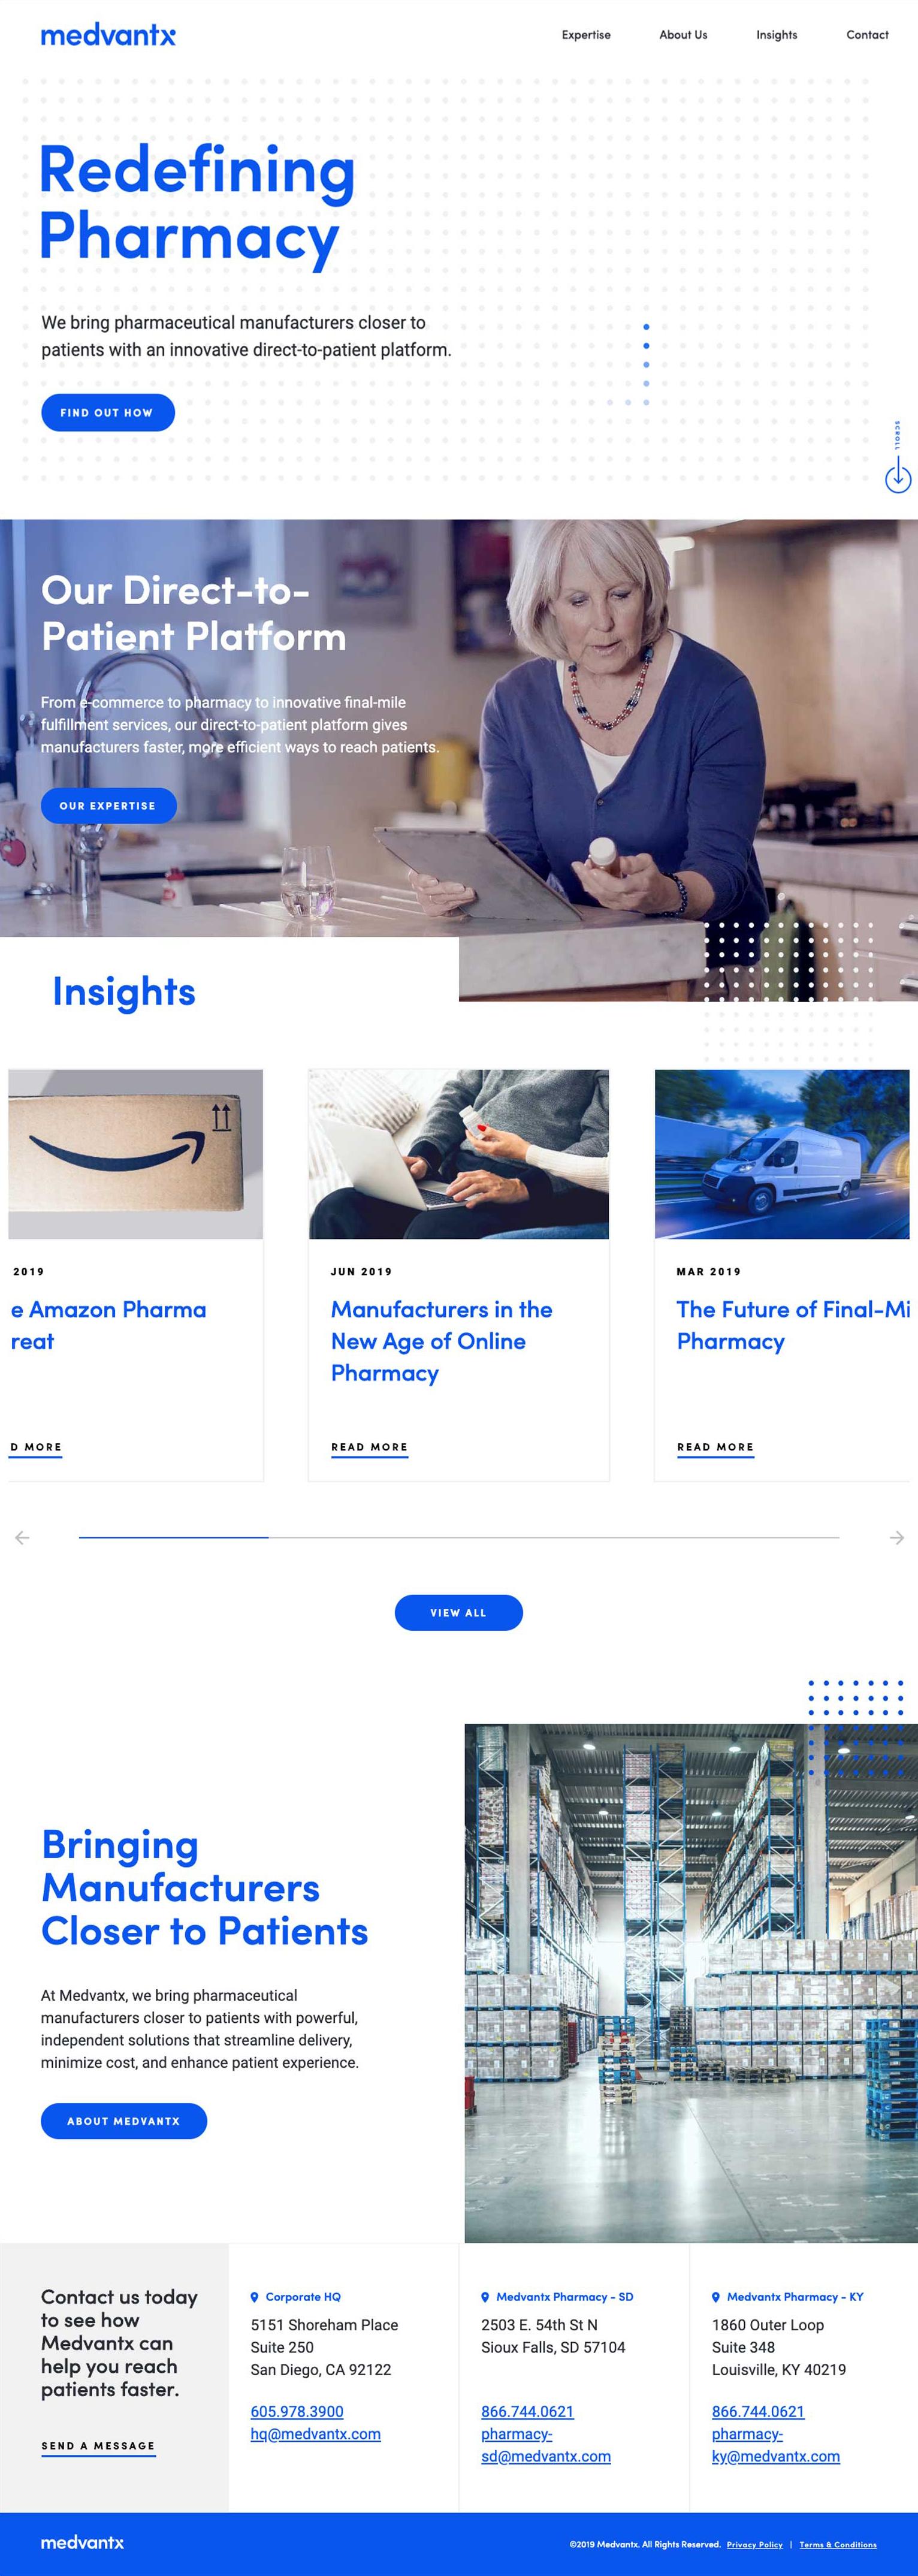 ignyte-branding-agency-web-design-medvantx-home-page-desktop-V4